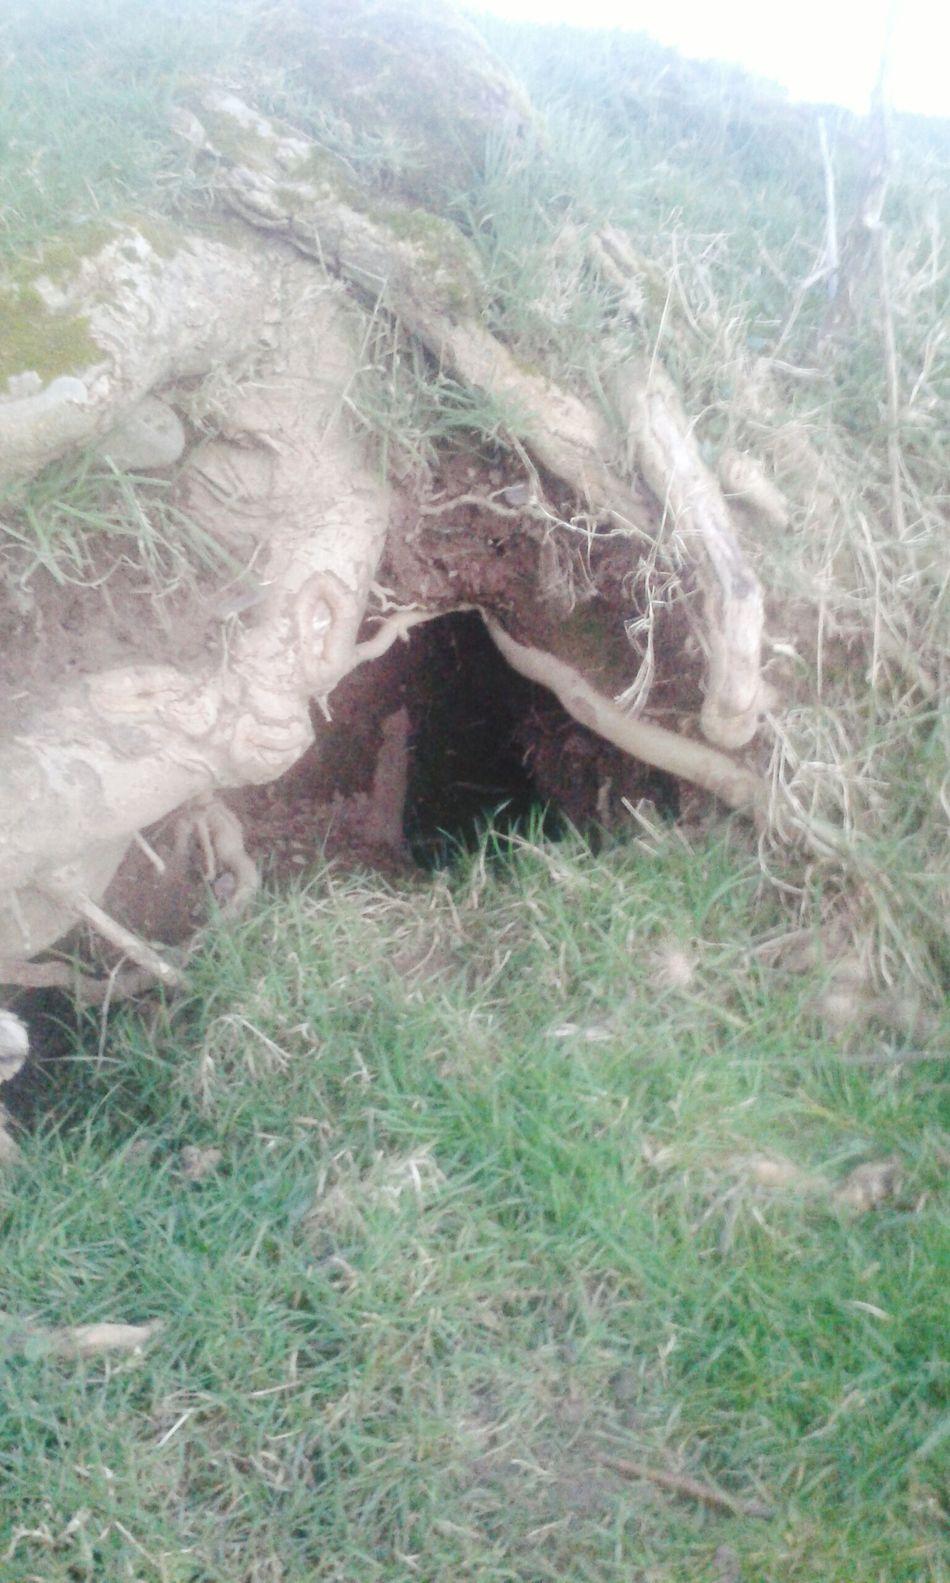 Mr Rabbit Rabbit Hole Nature_collection Eyeemphoto Nature Hi! OpenEdit Eye Em Nature Lover